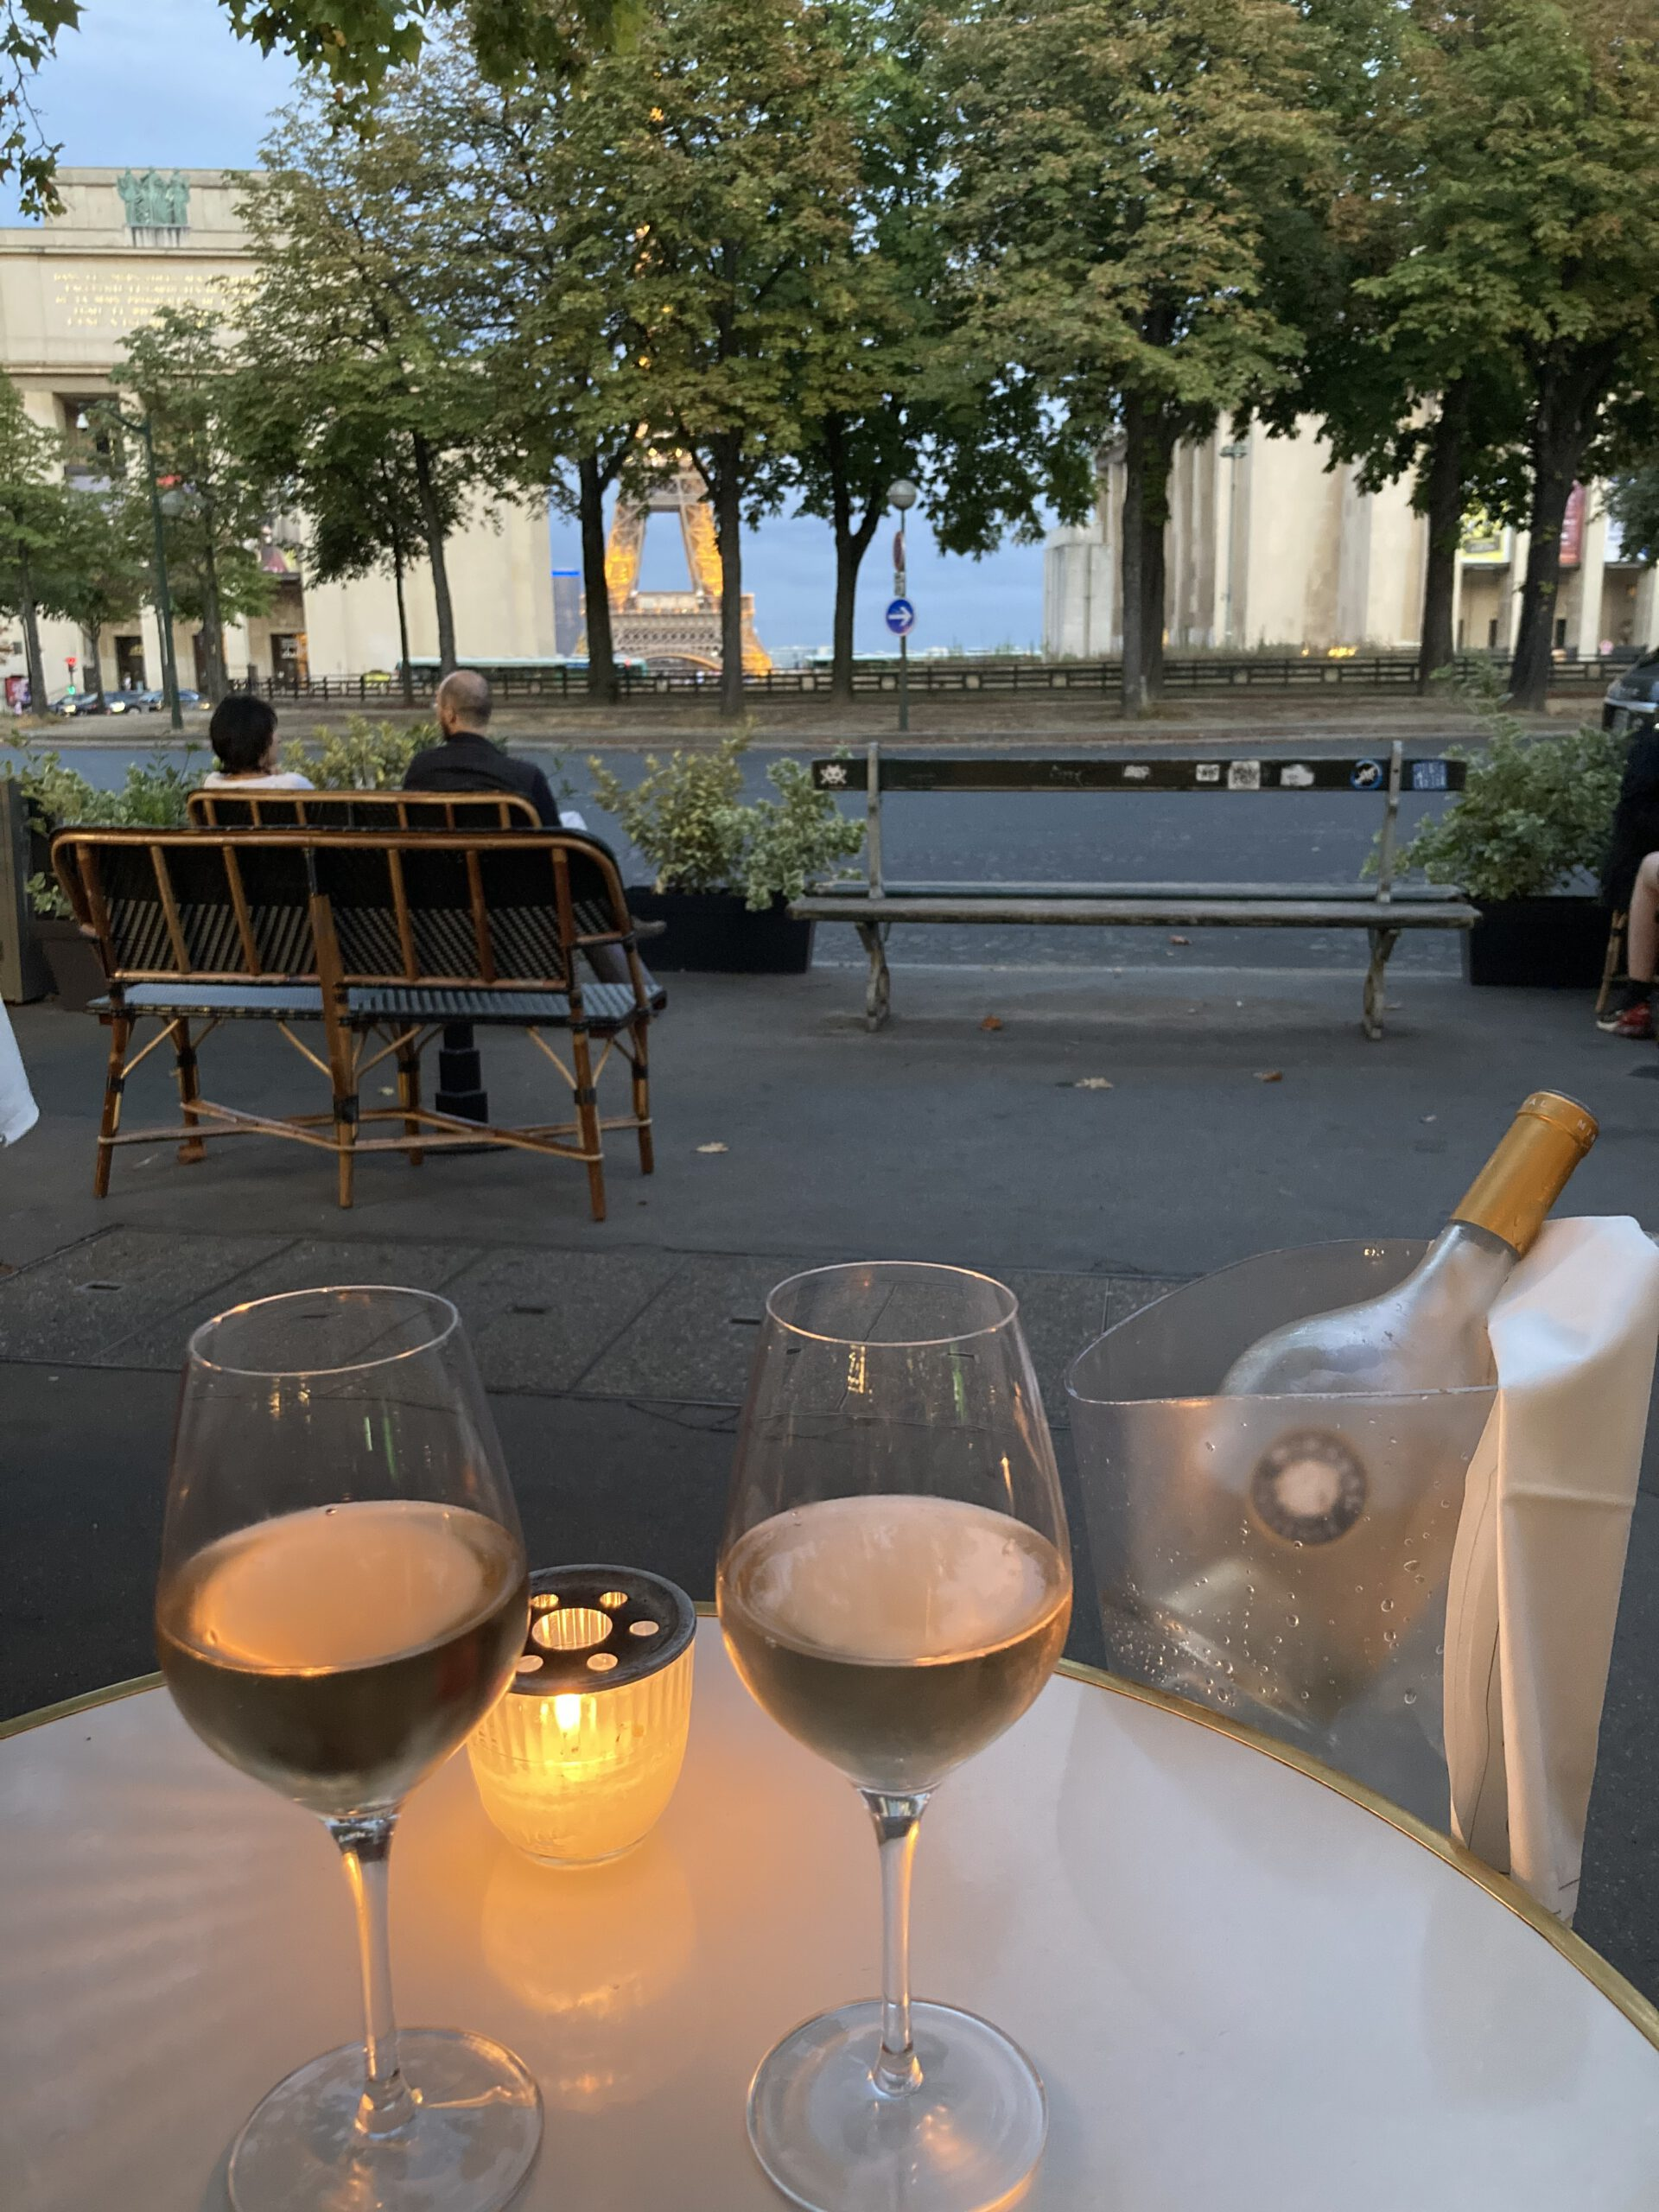 Le Cafe du Trocadero